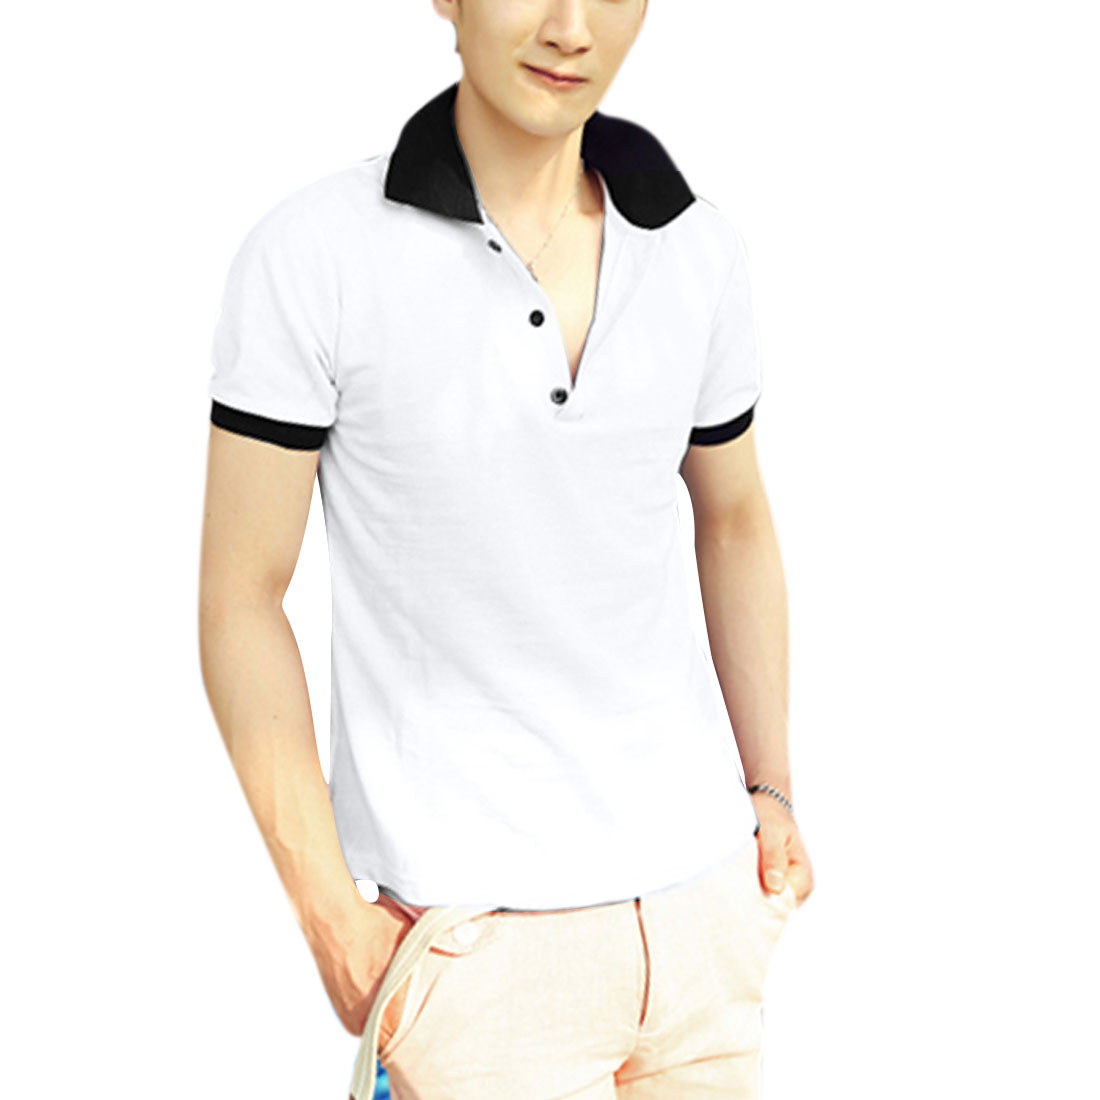 Men Convertible Collar Ribbing Cuffs Shirt White M